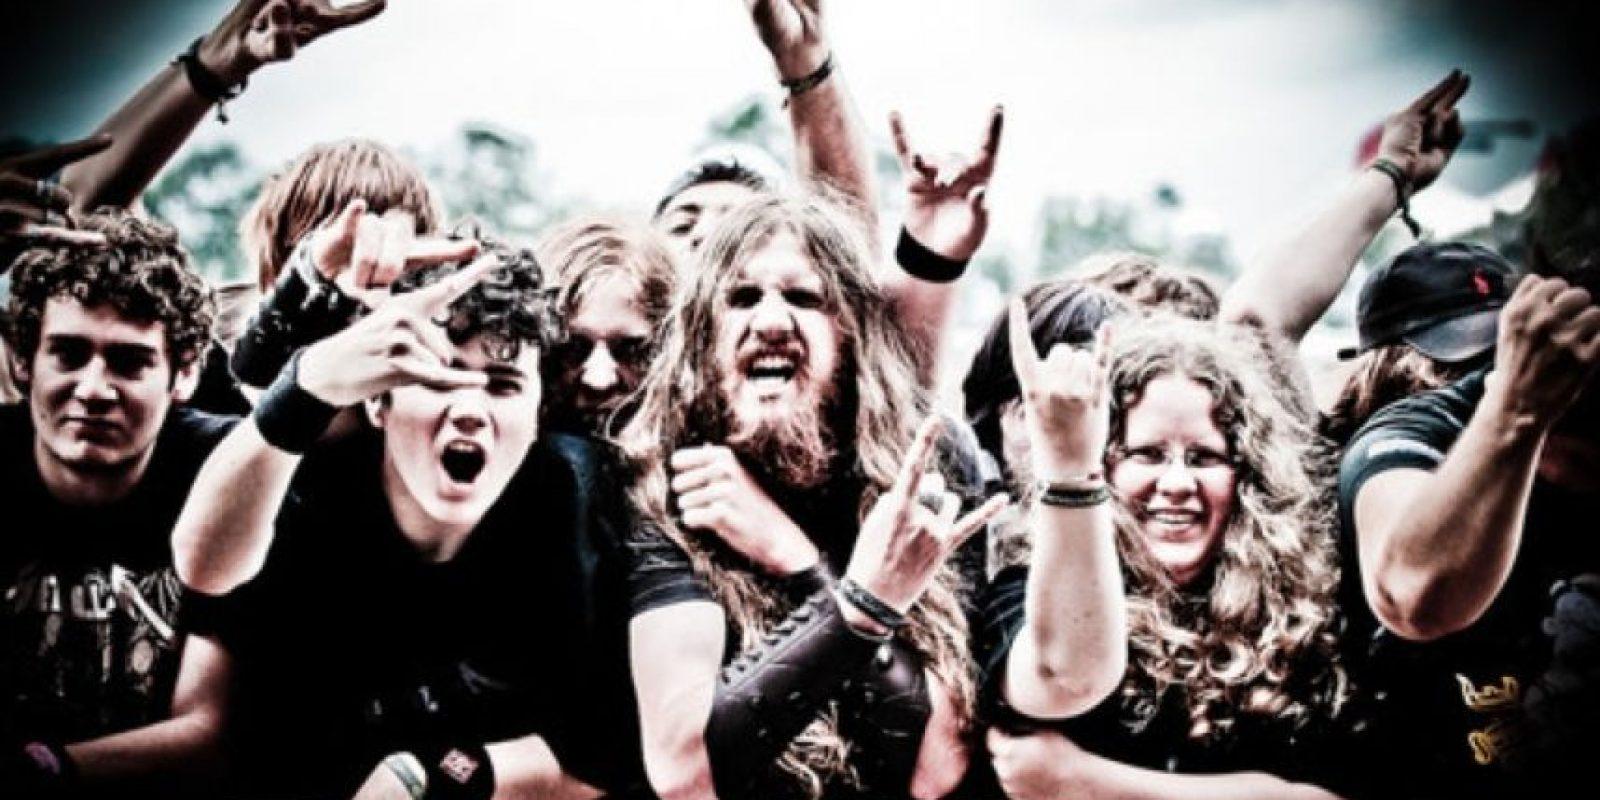 """A los aficionados a la música extrema les gusta escuchar melodías que coincidan con ellos, al experimentar enojo o ira"", mencionó Leah Sharman. Foto:Pinterest"